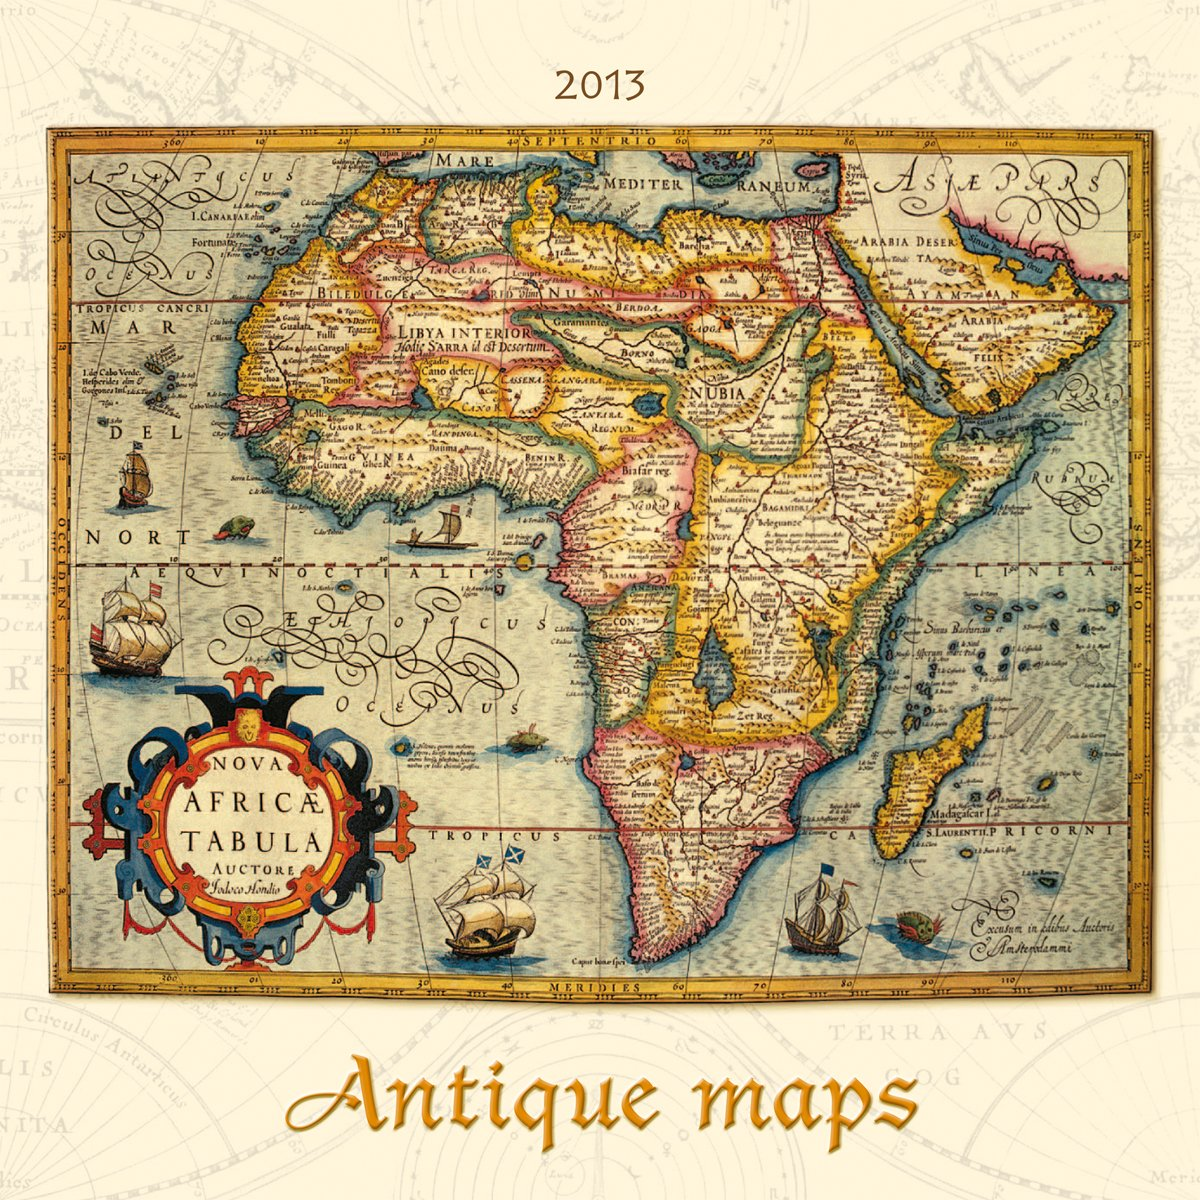 Antique Maps Bildkalender 2013